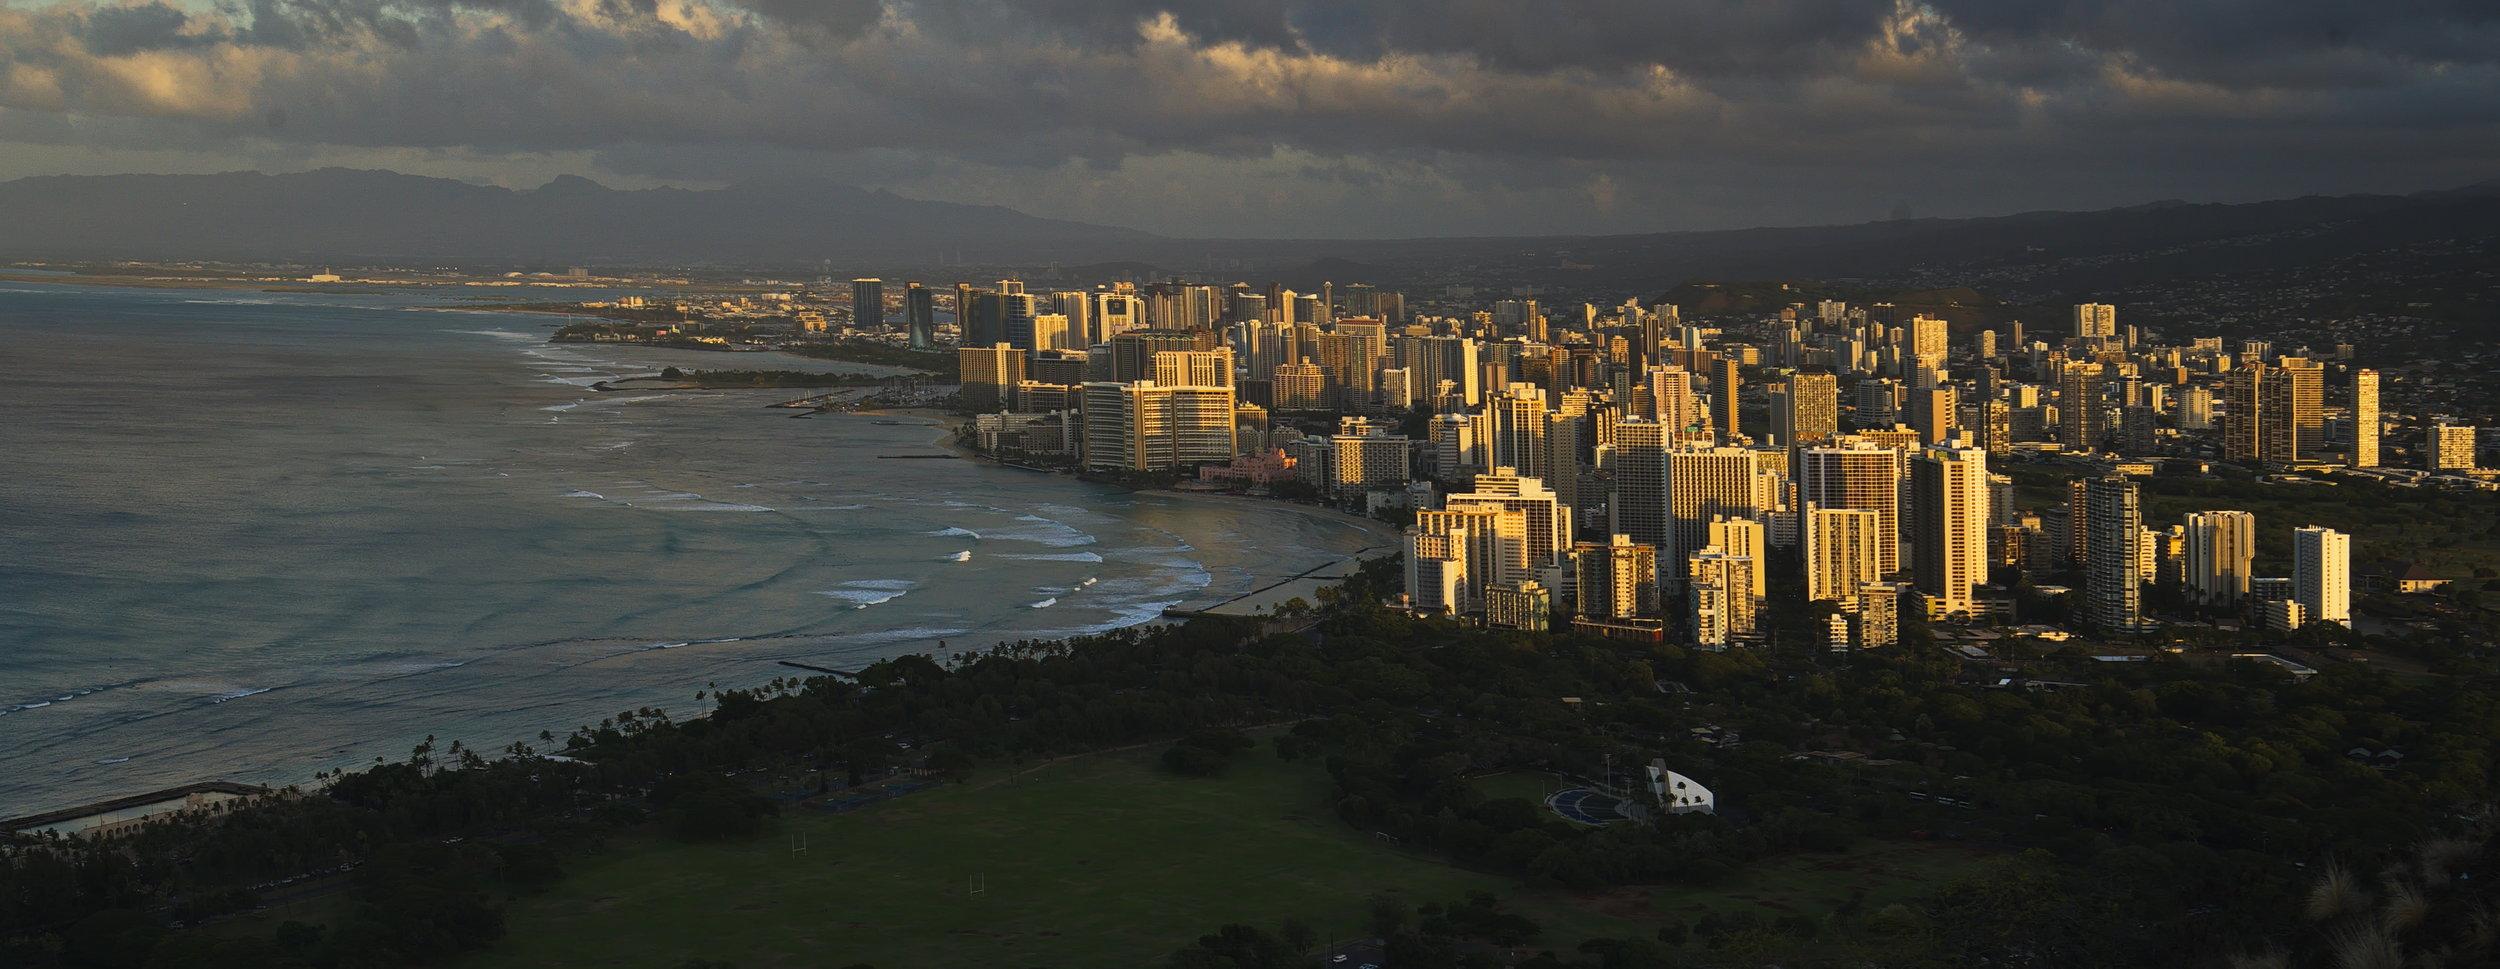 Diamond Head view of Honolulu. Credit: Paula Moehlenkamp